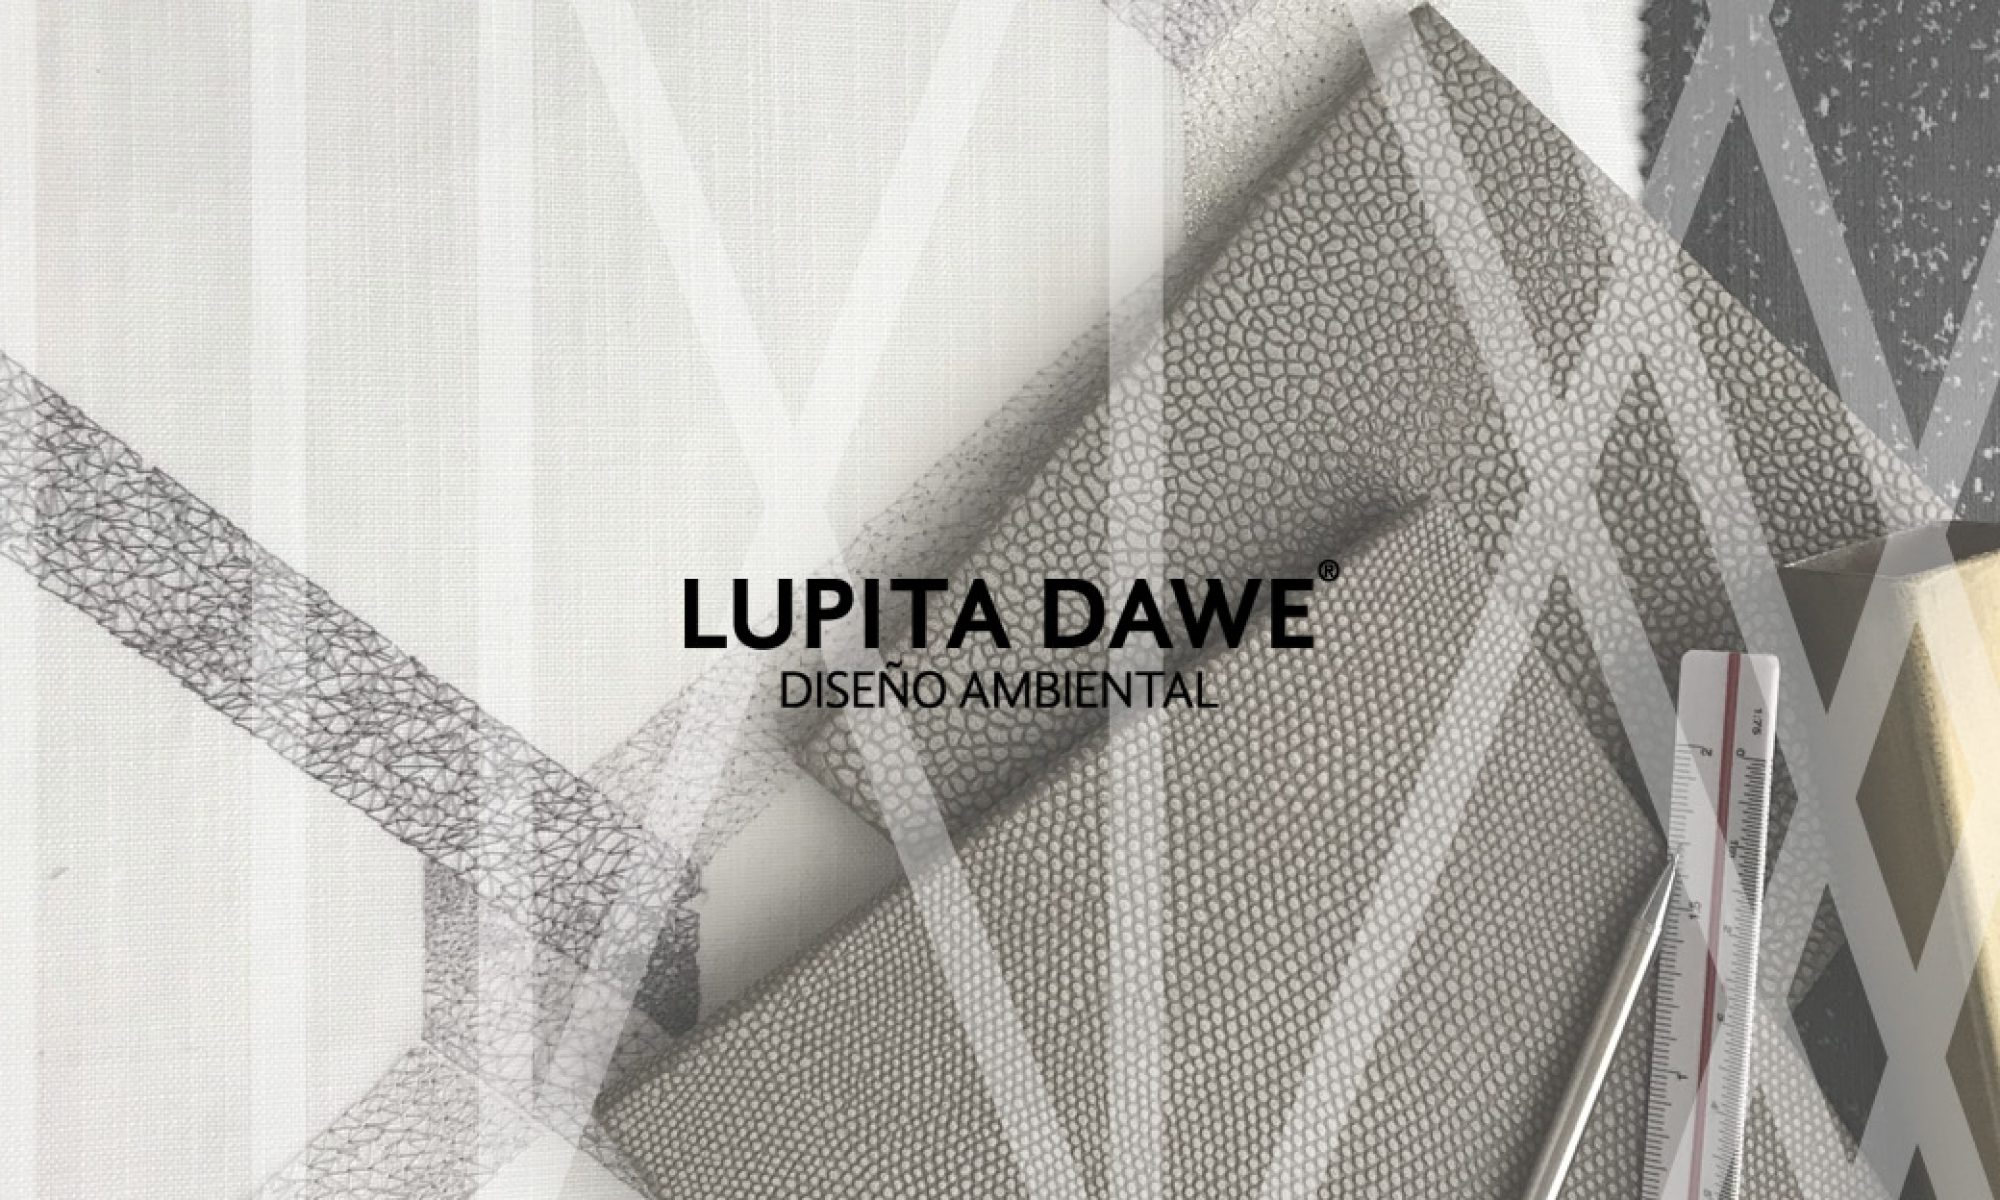 Lupita Dawe - Diseño Ambiental